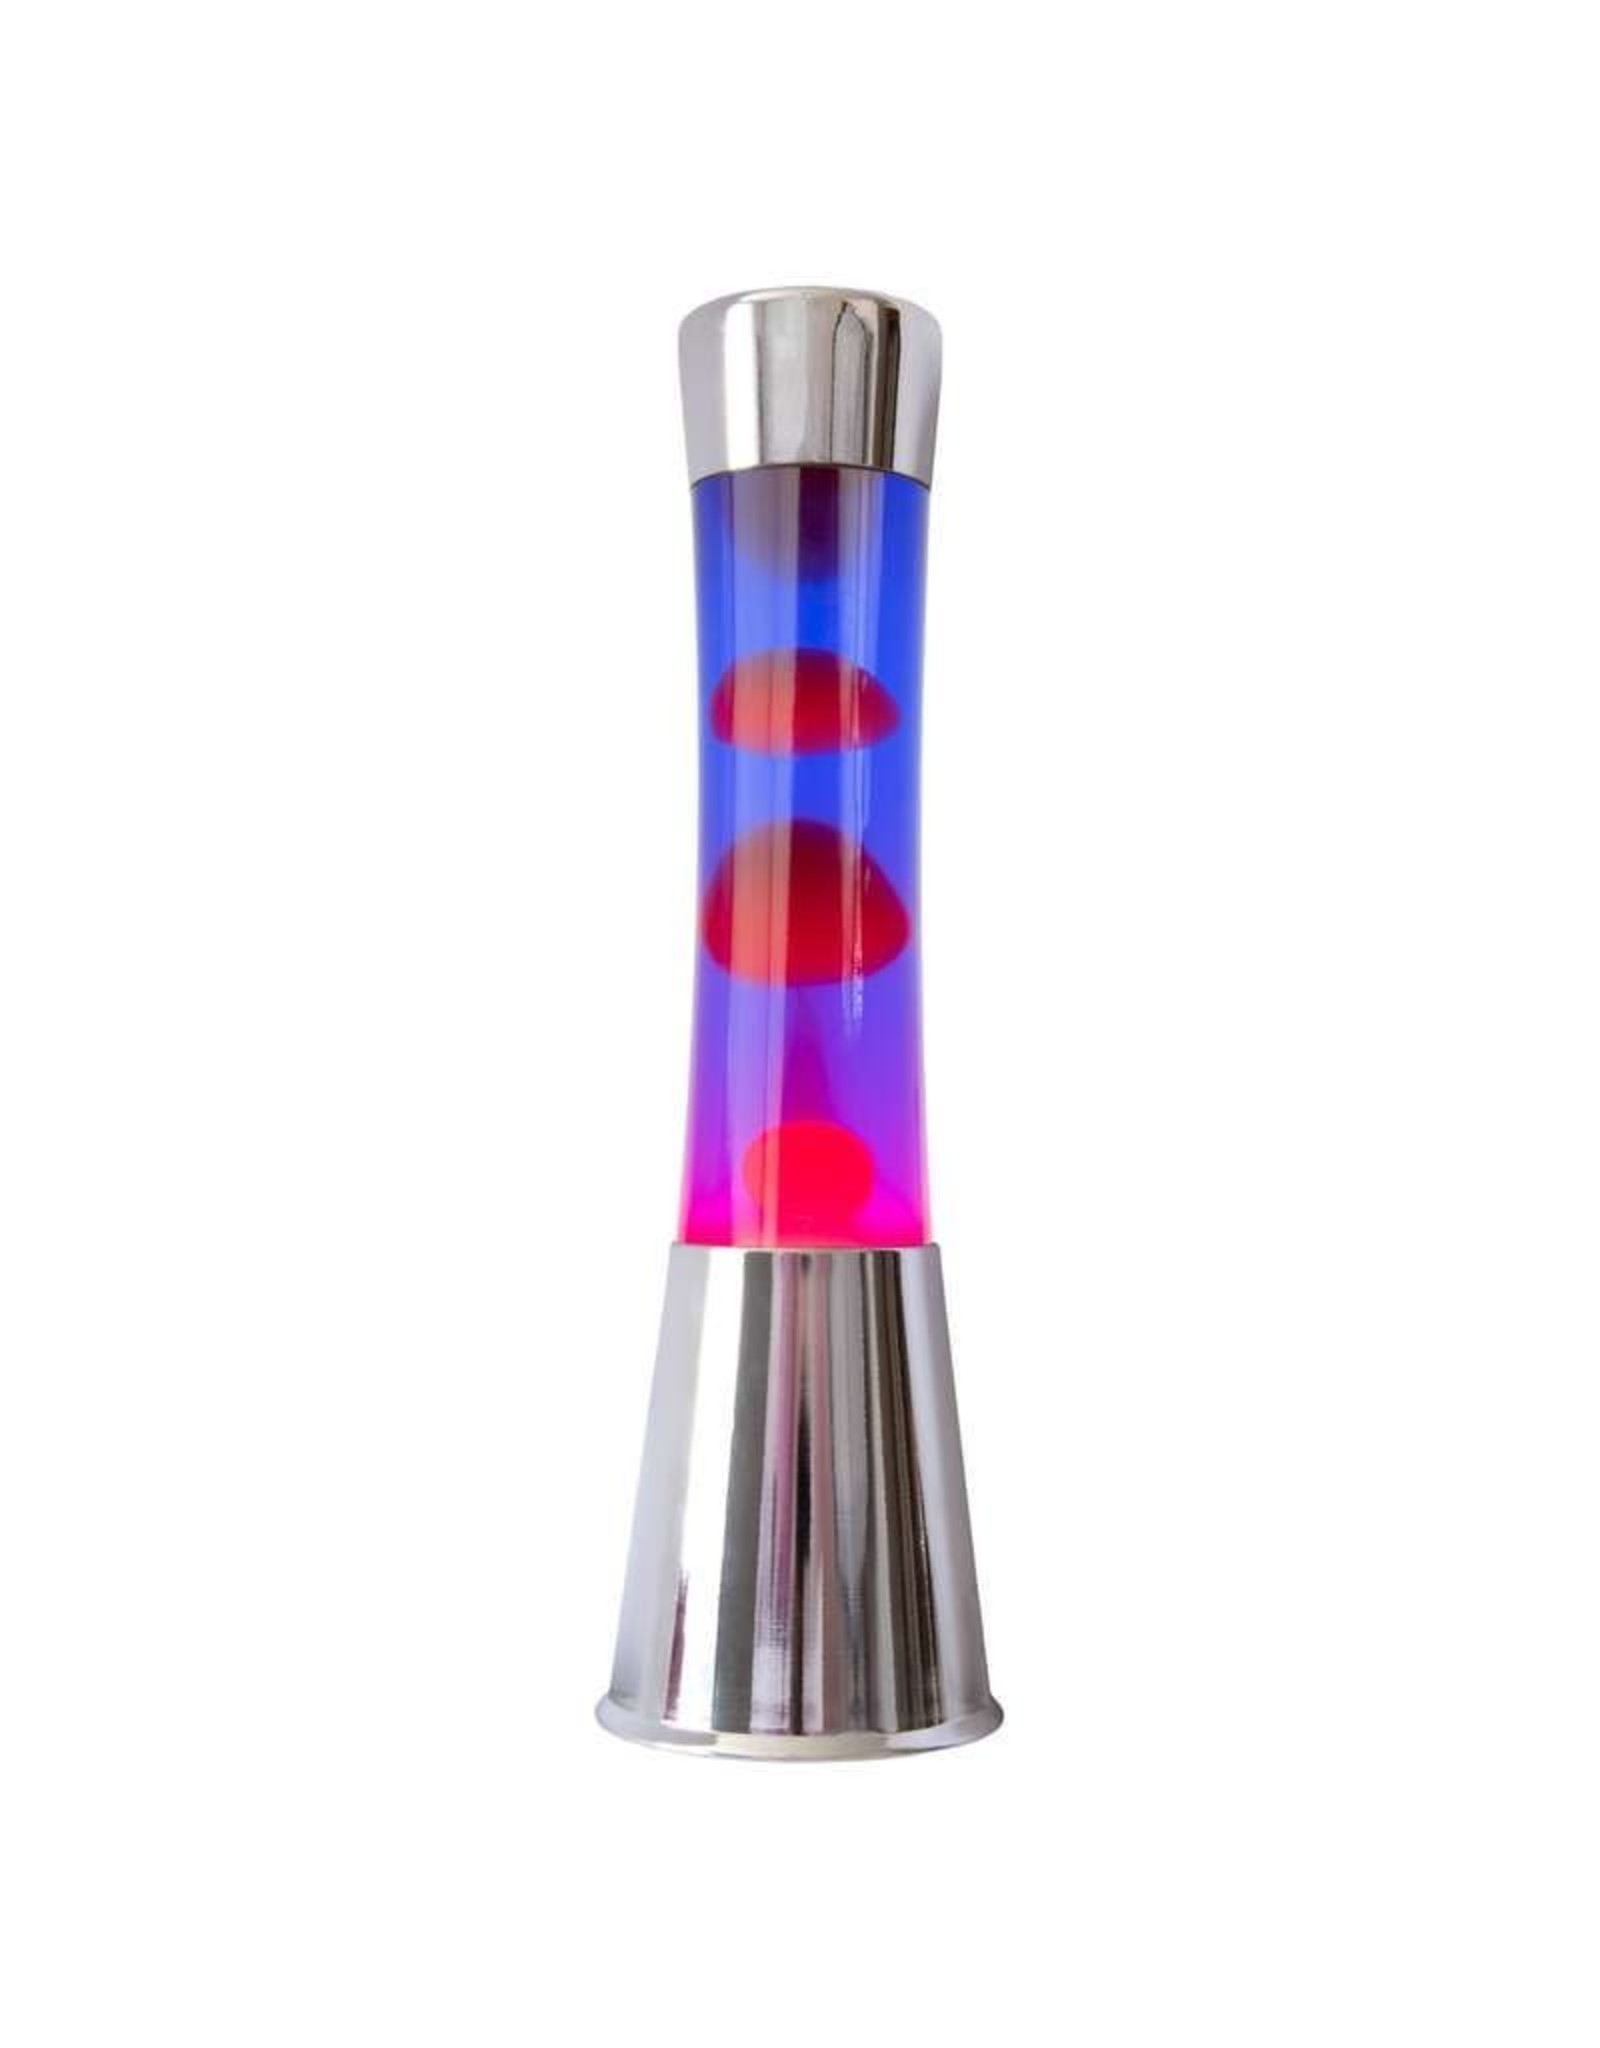 lava lamp - chrome base/red lava/purple liquid